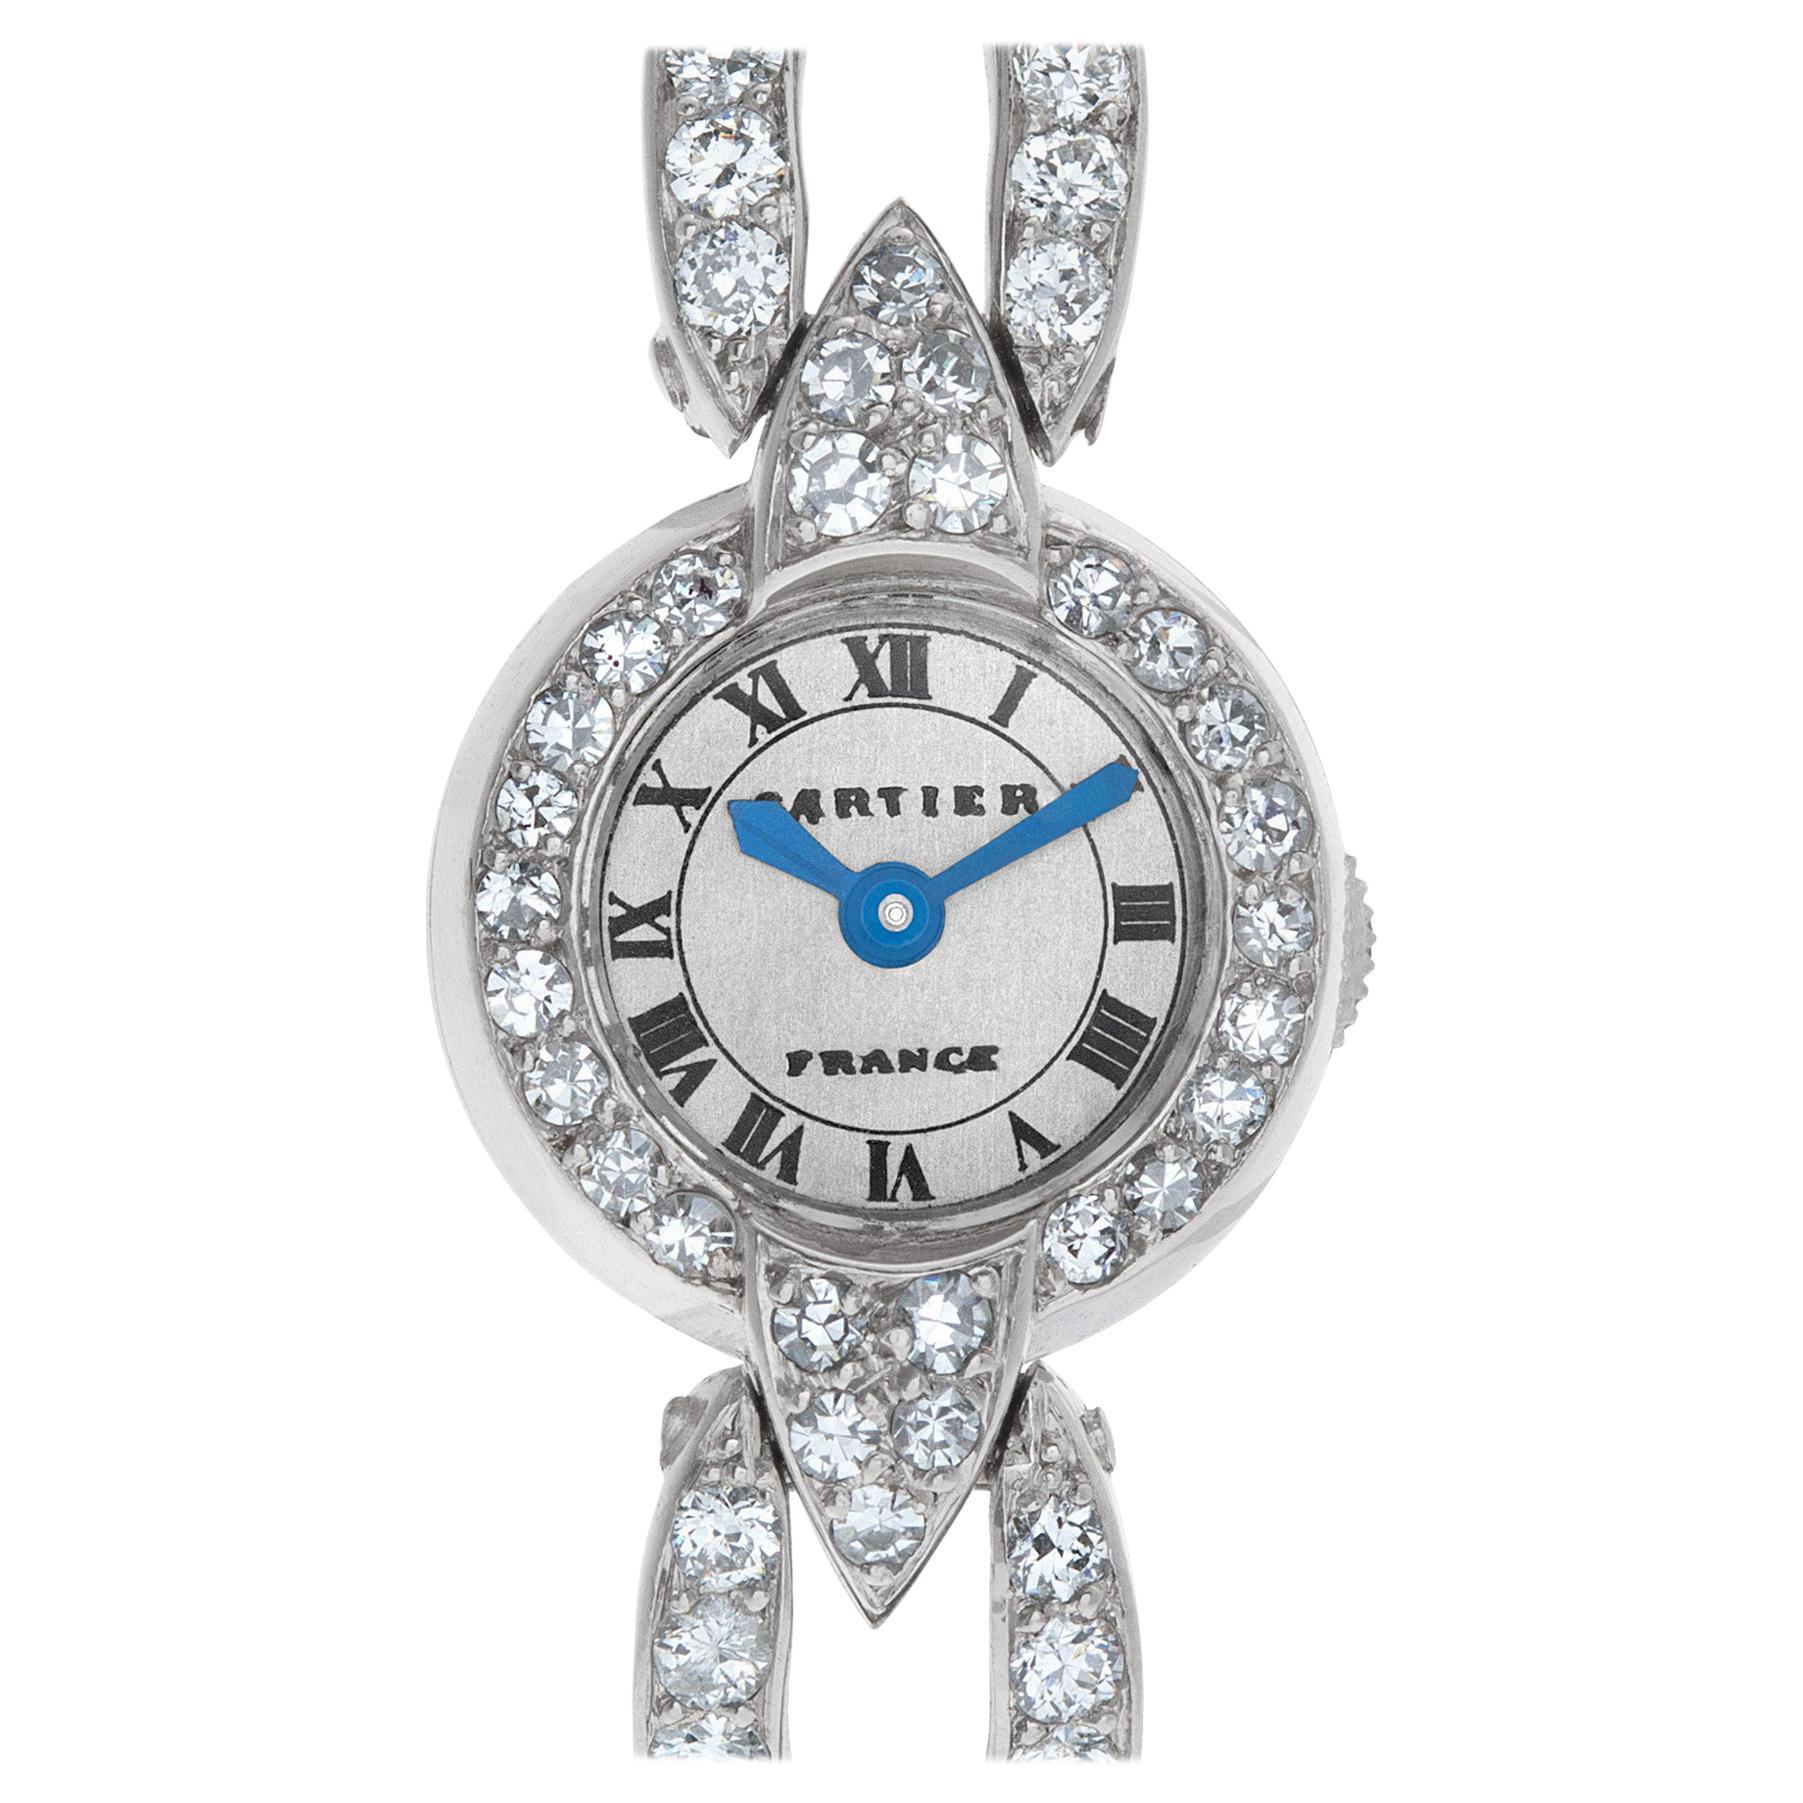 Cartier Ladies Cocktail Watch in Platinum with Diamonds